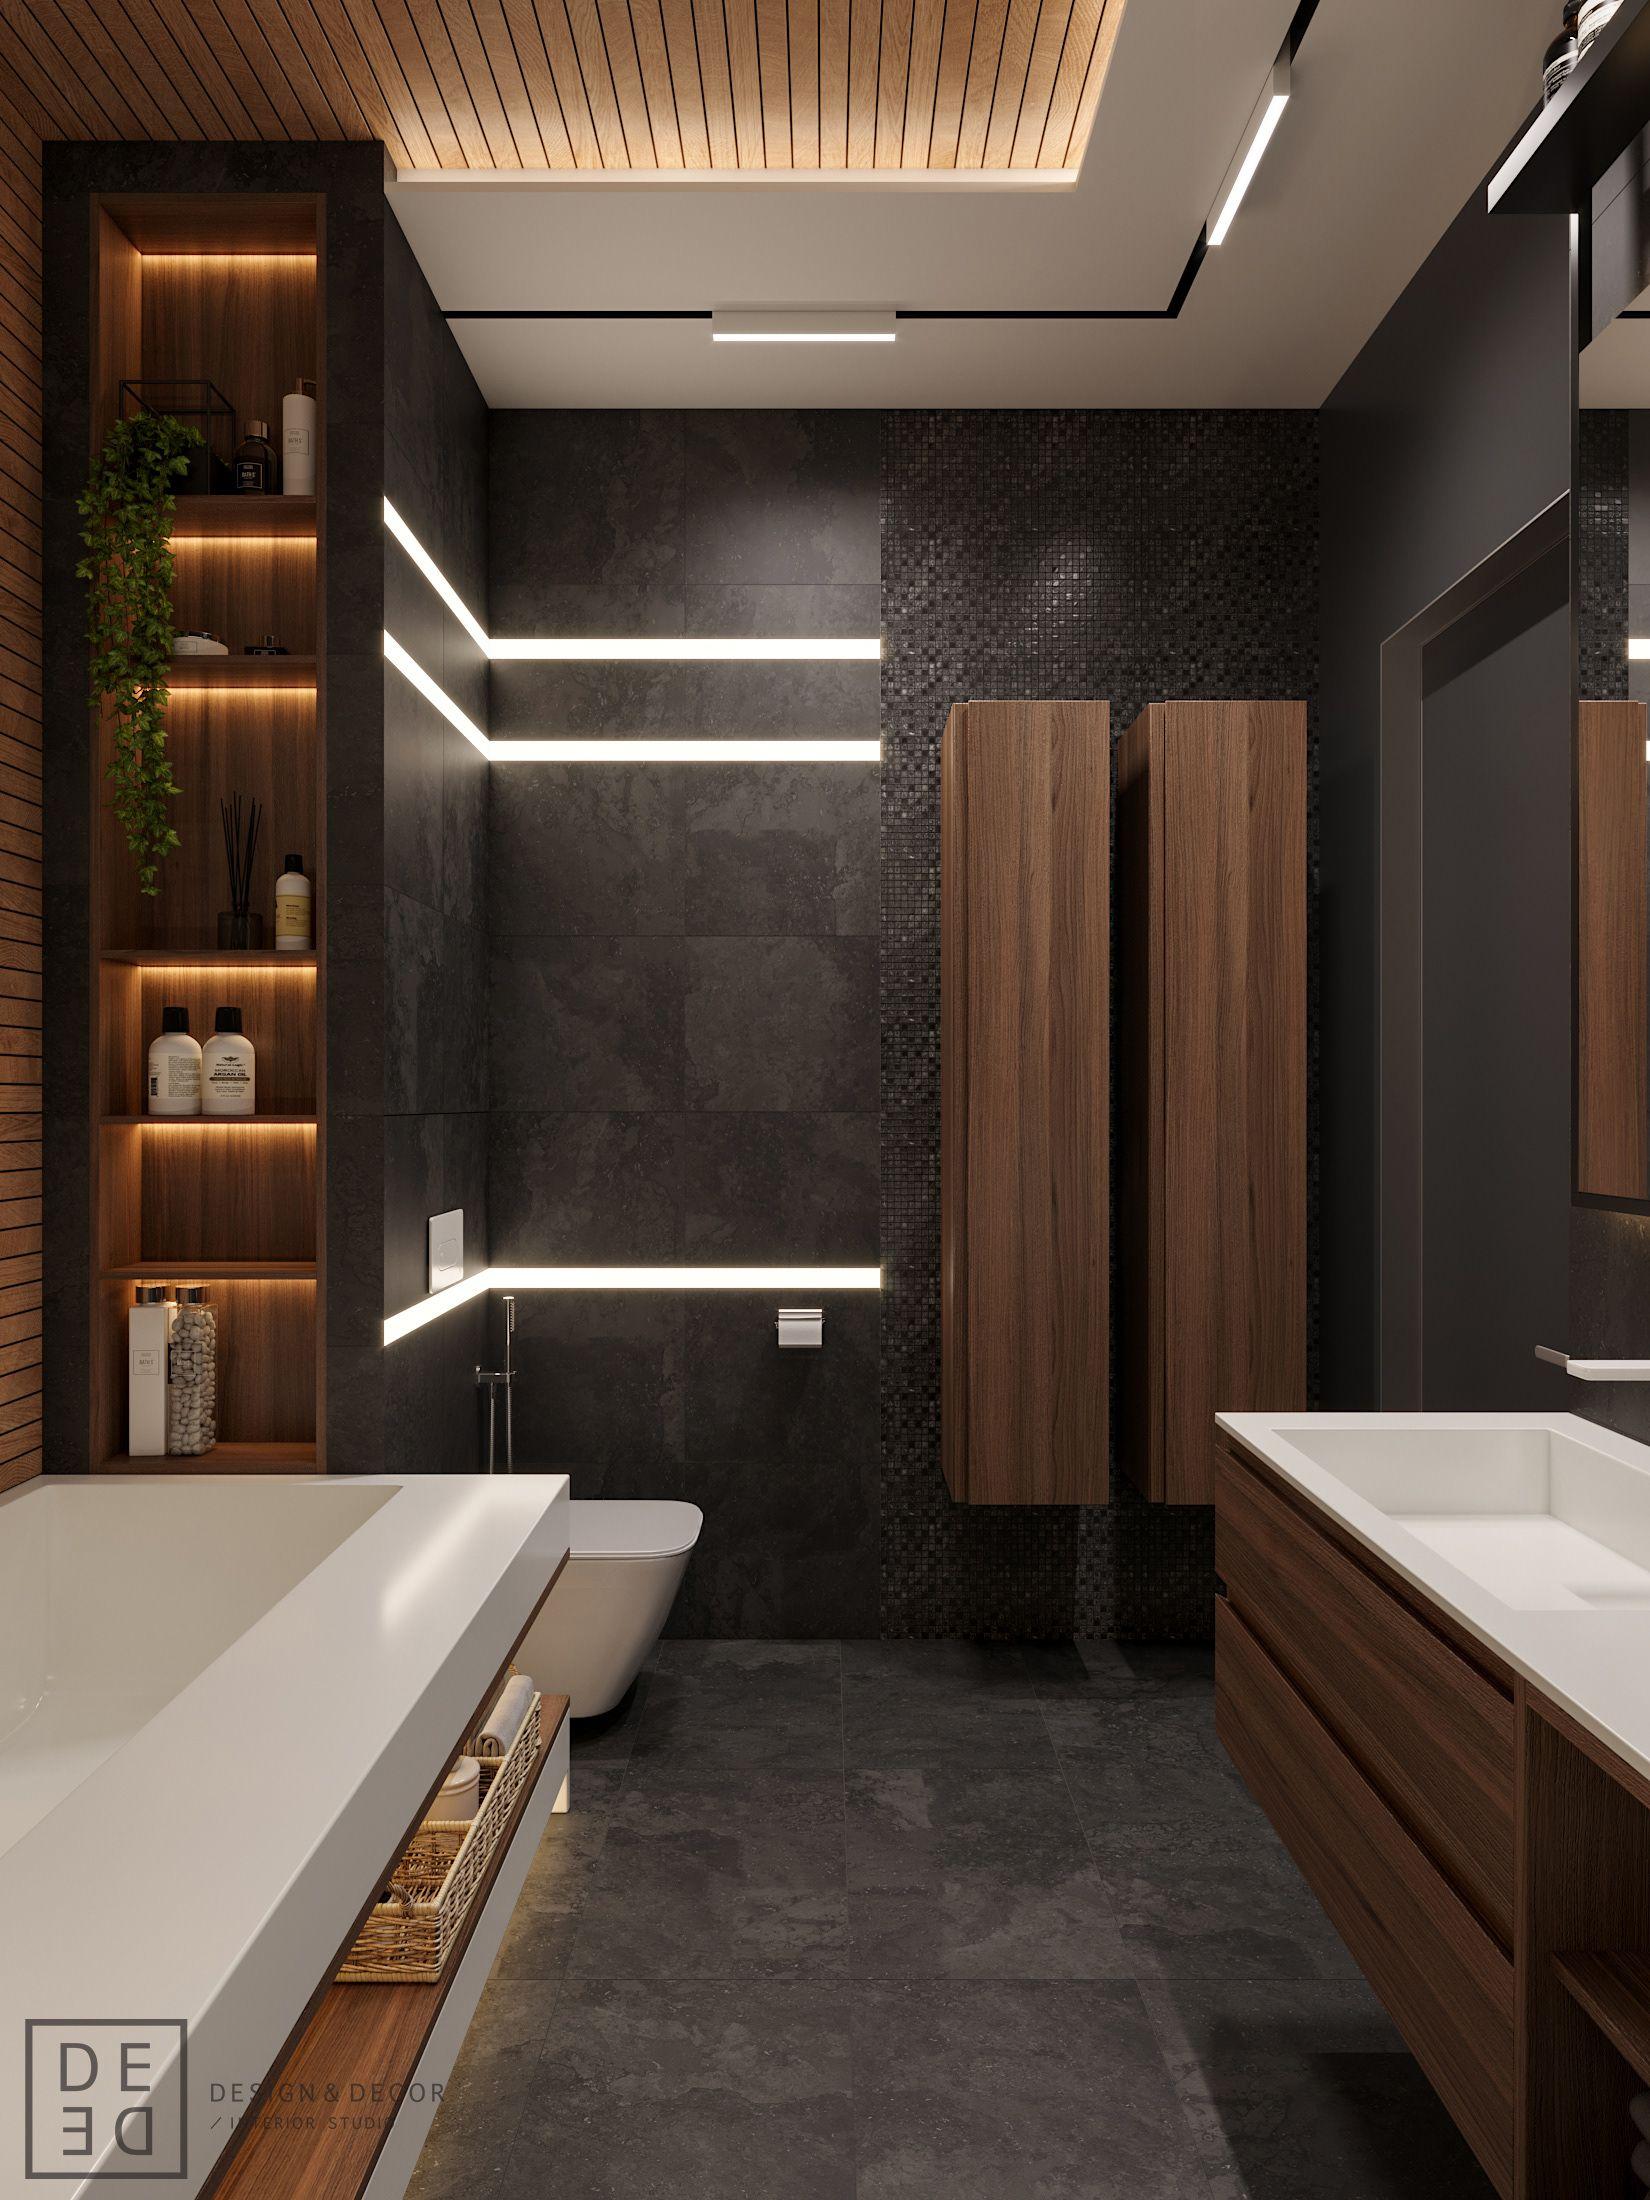 De De Wooden Luxury On Behance Modern Bathroom Design Master